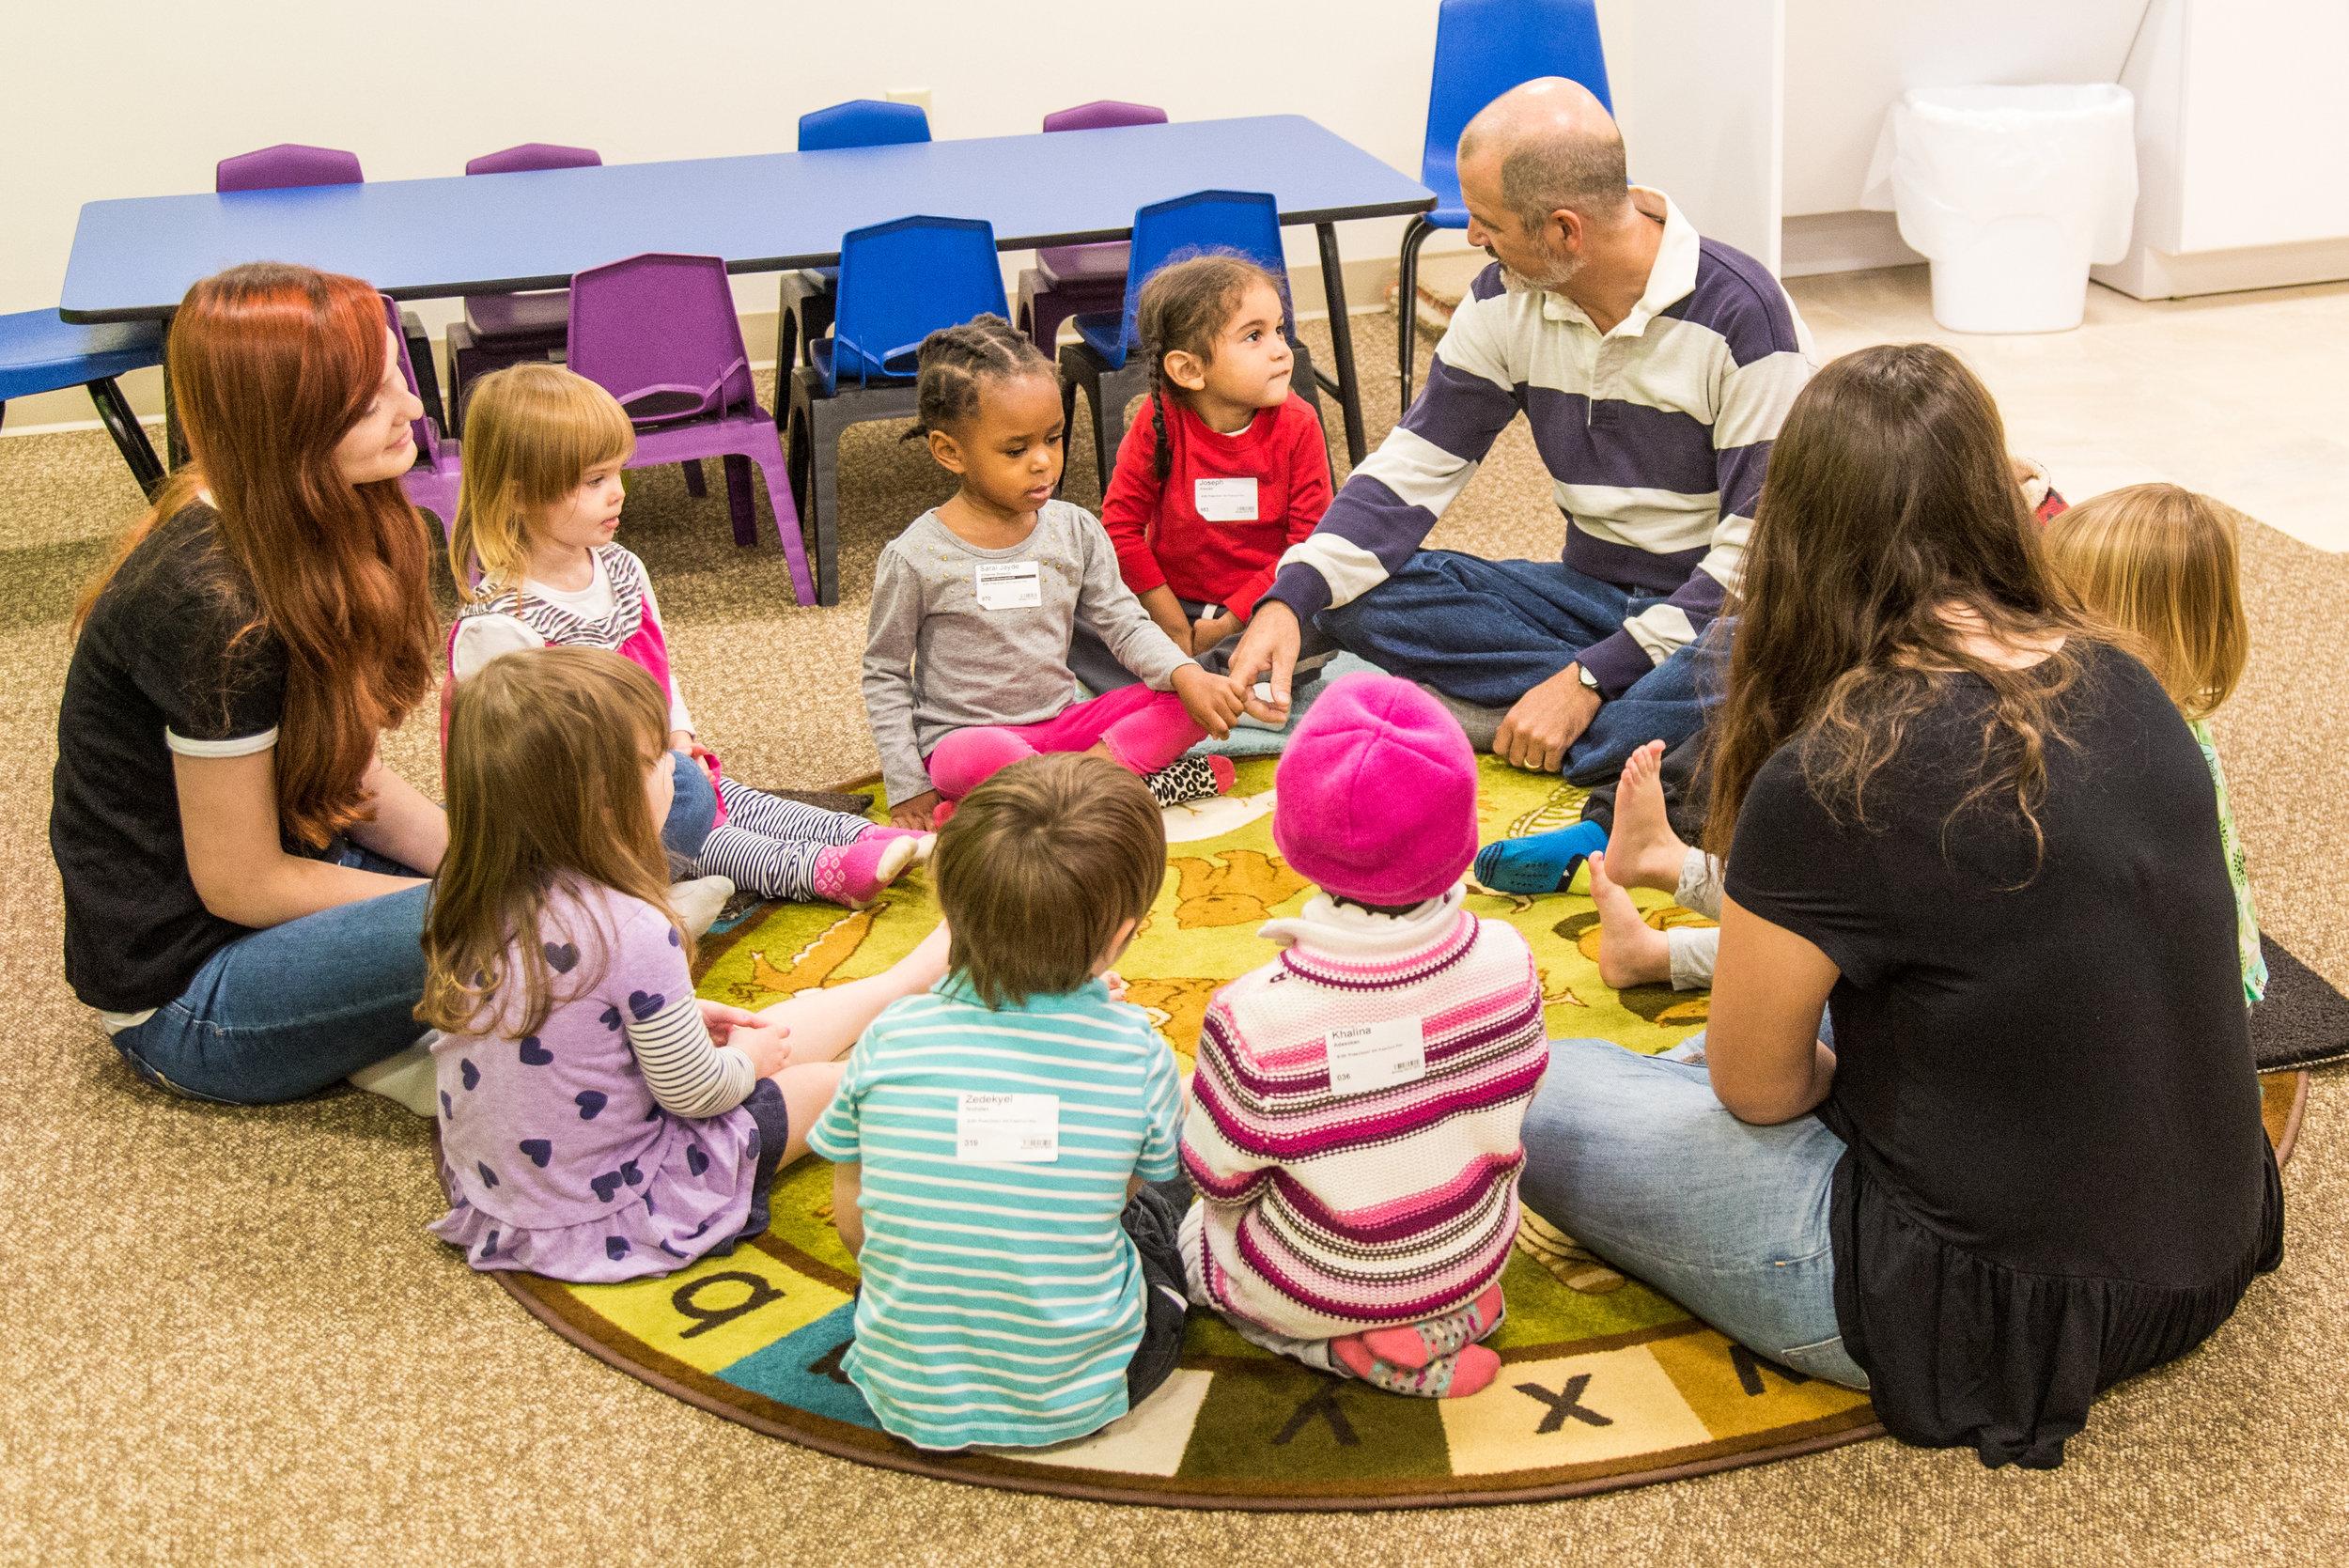 Chris teaching preschool on Sunday mornings